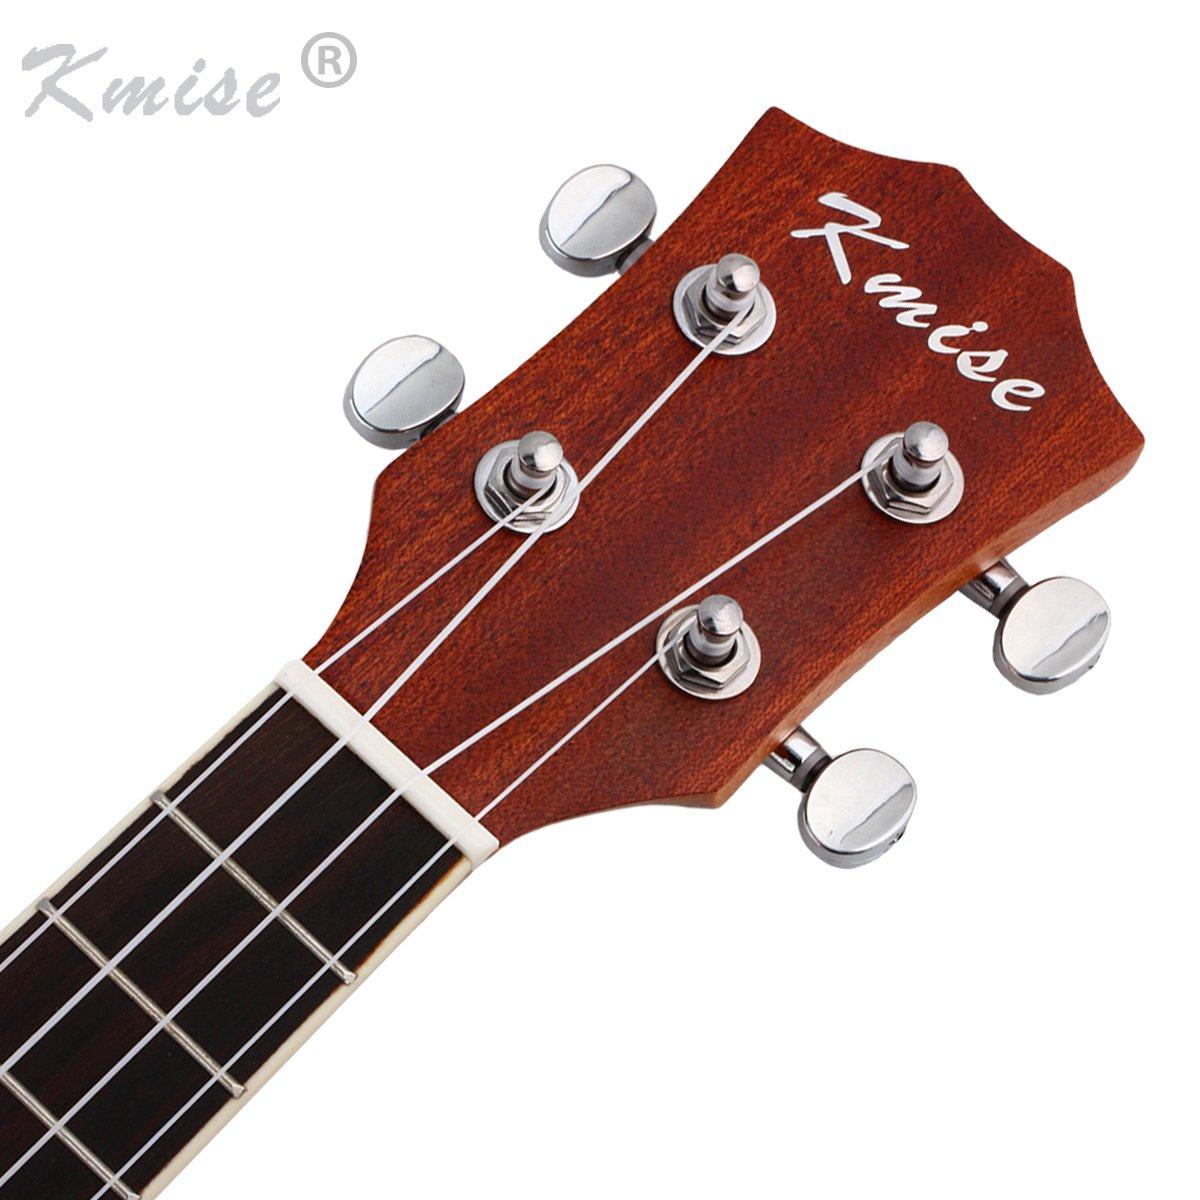 Kmise Banjo ukul/él/é avec sac et tuner Concert 23 inch MI2232